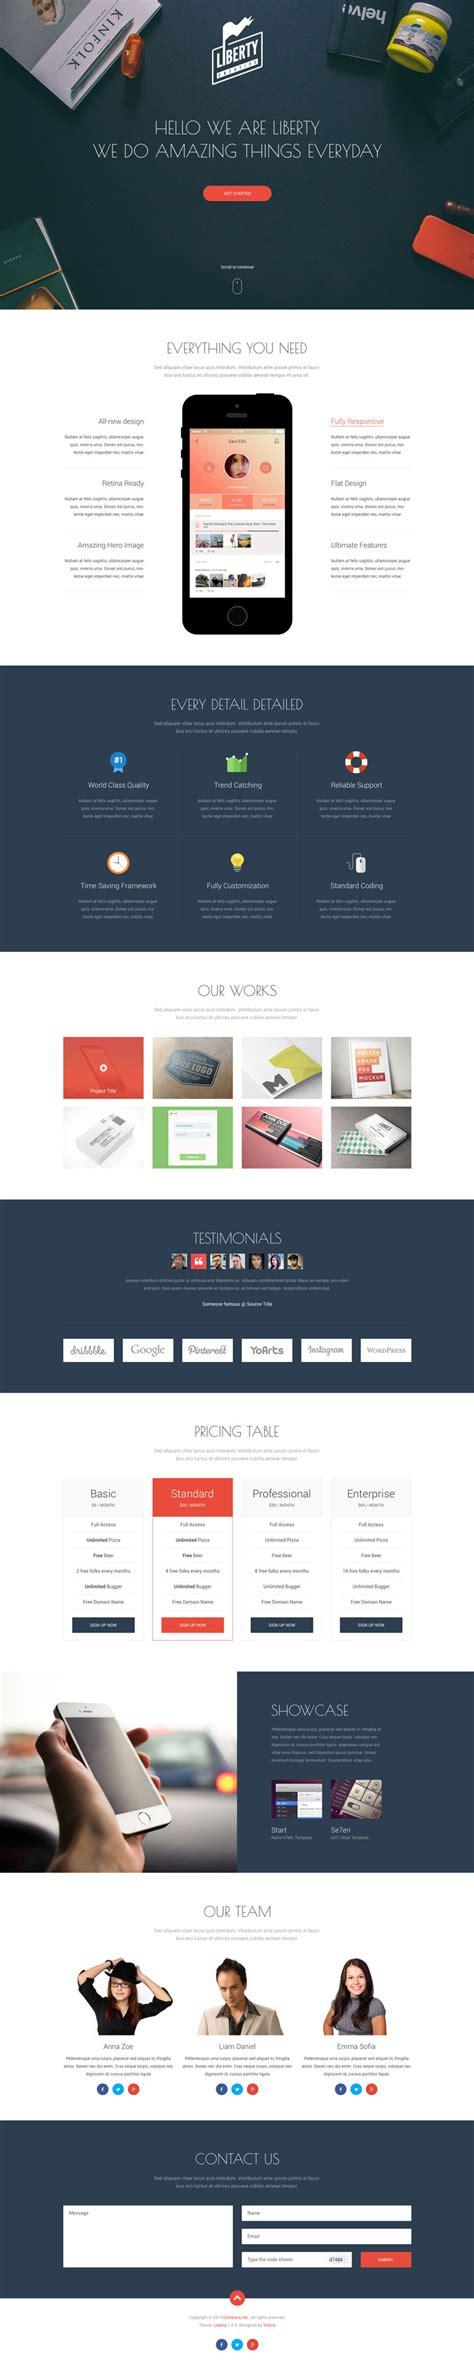 55 incredible parallax single page website templates wpfreeware